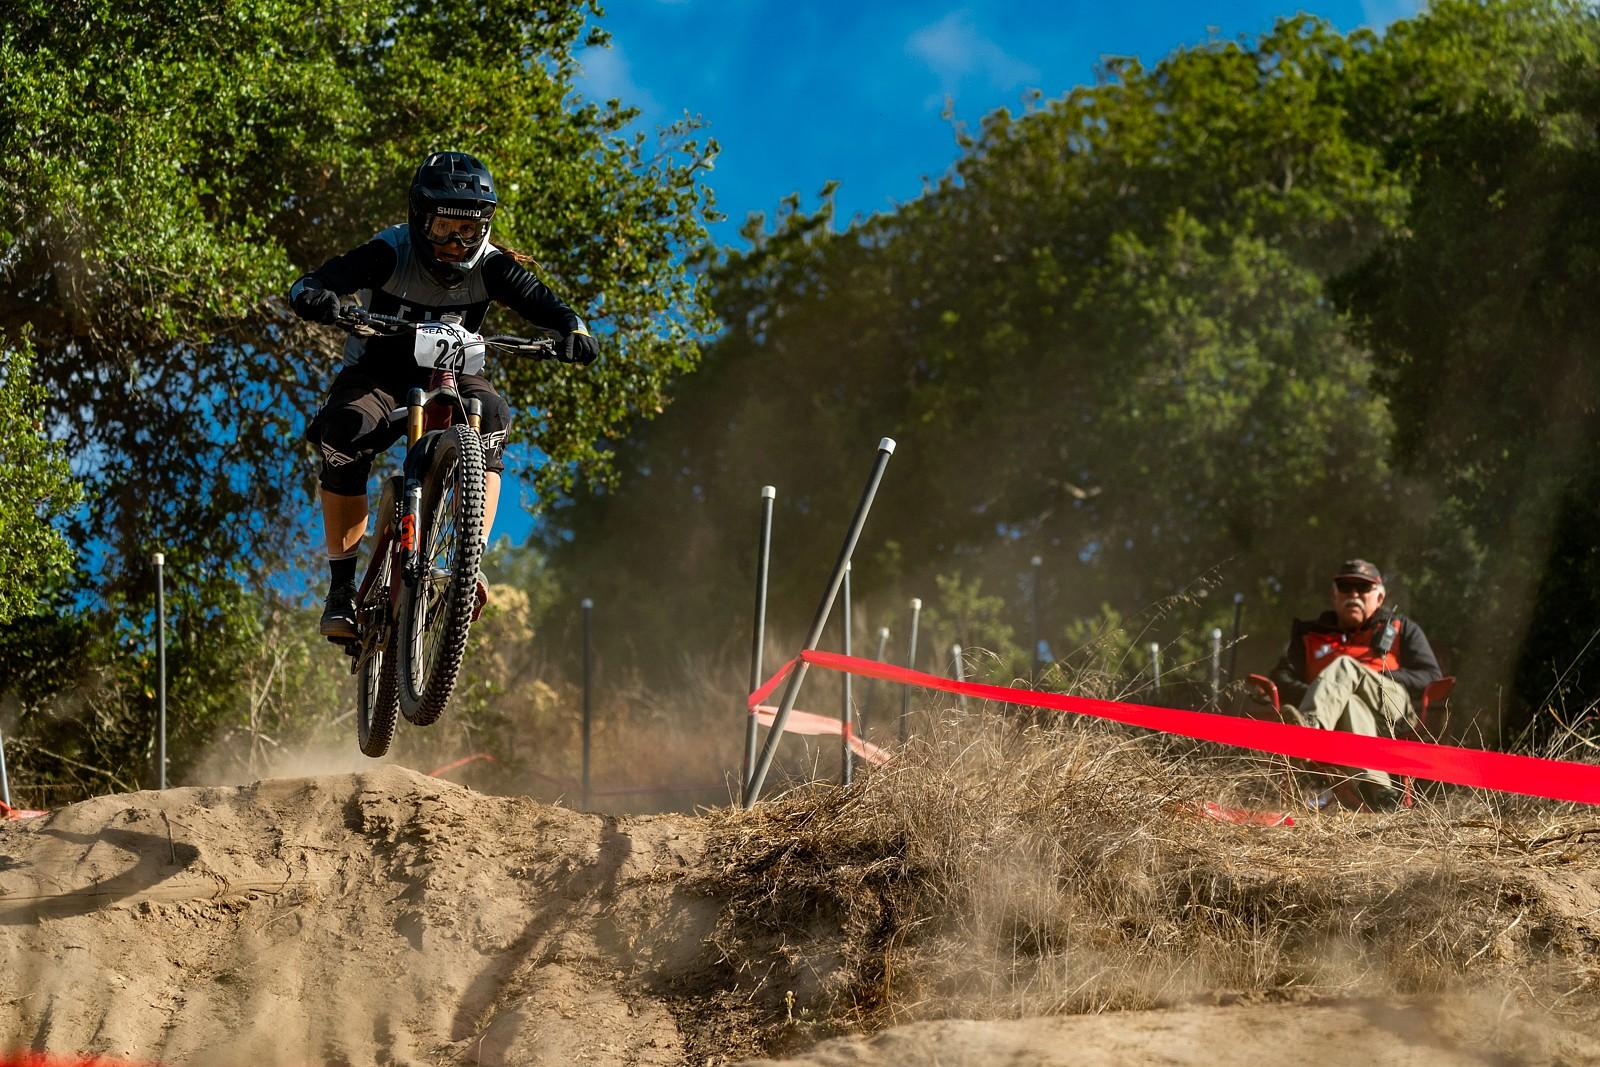 Porsha Murdock - Zuestman - Mountain Biking Pictures - Vital MTB